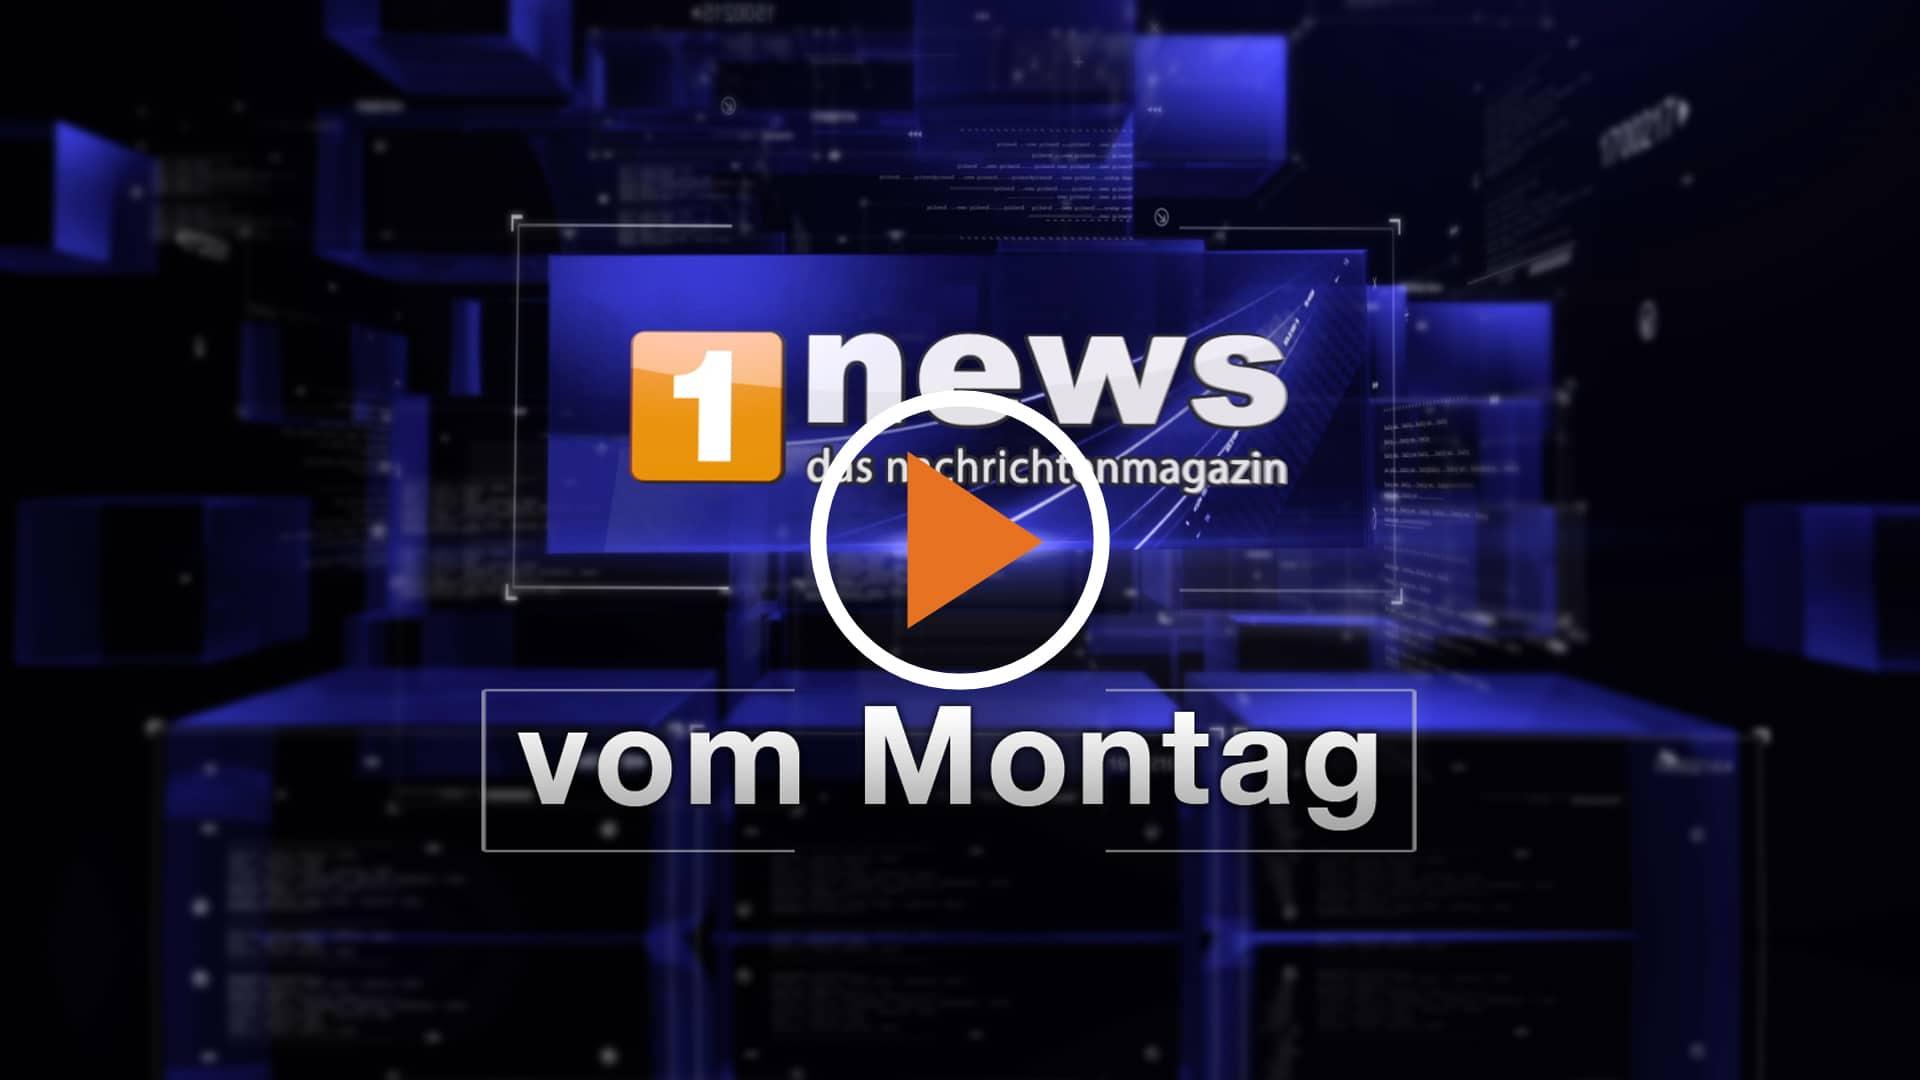 Screen_1news Montag